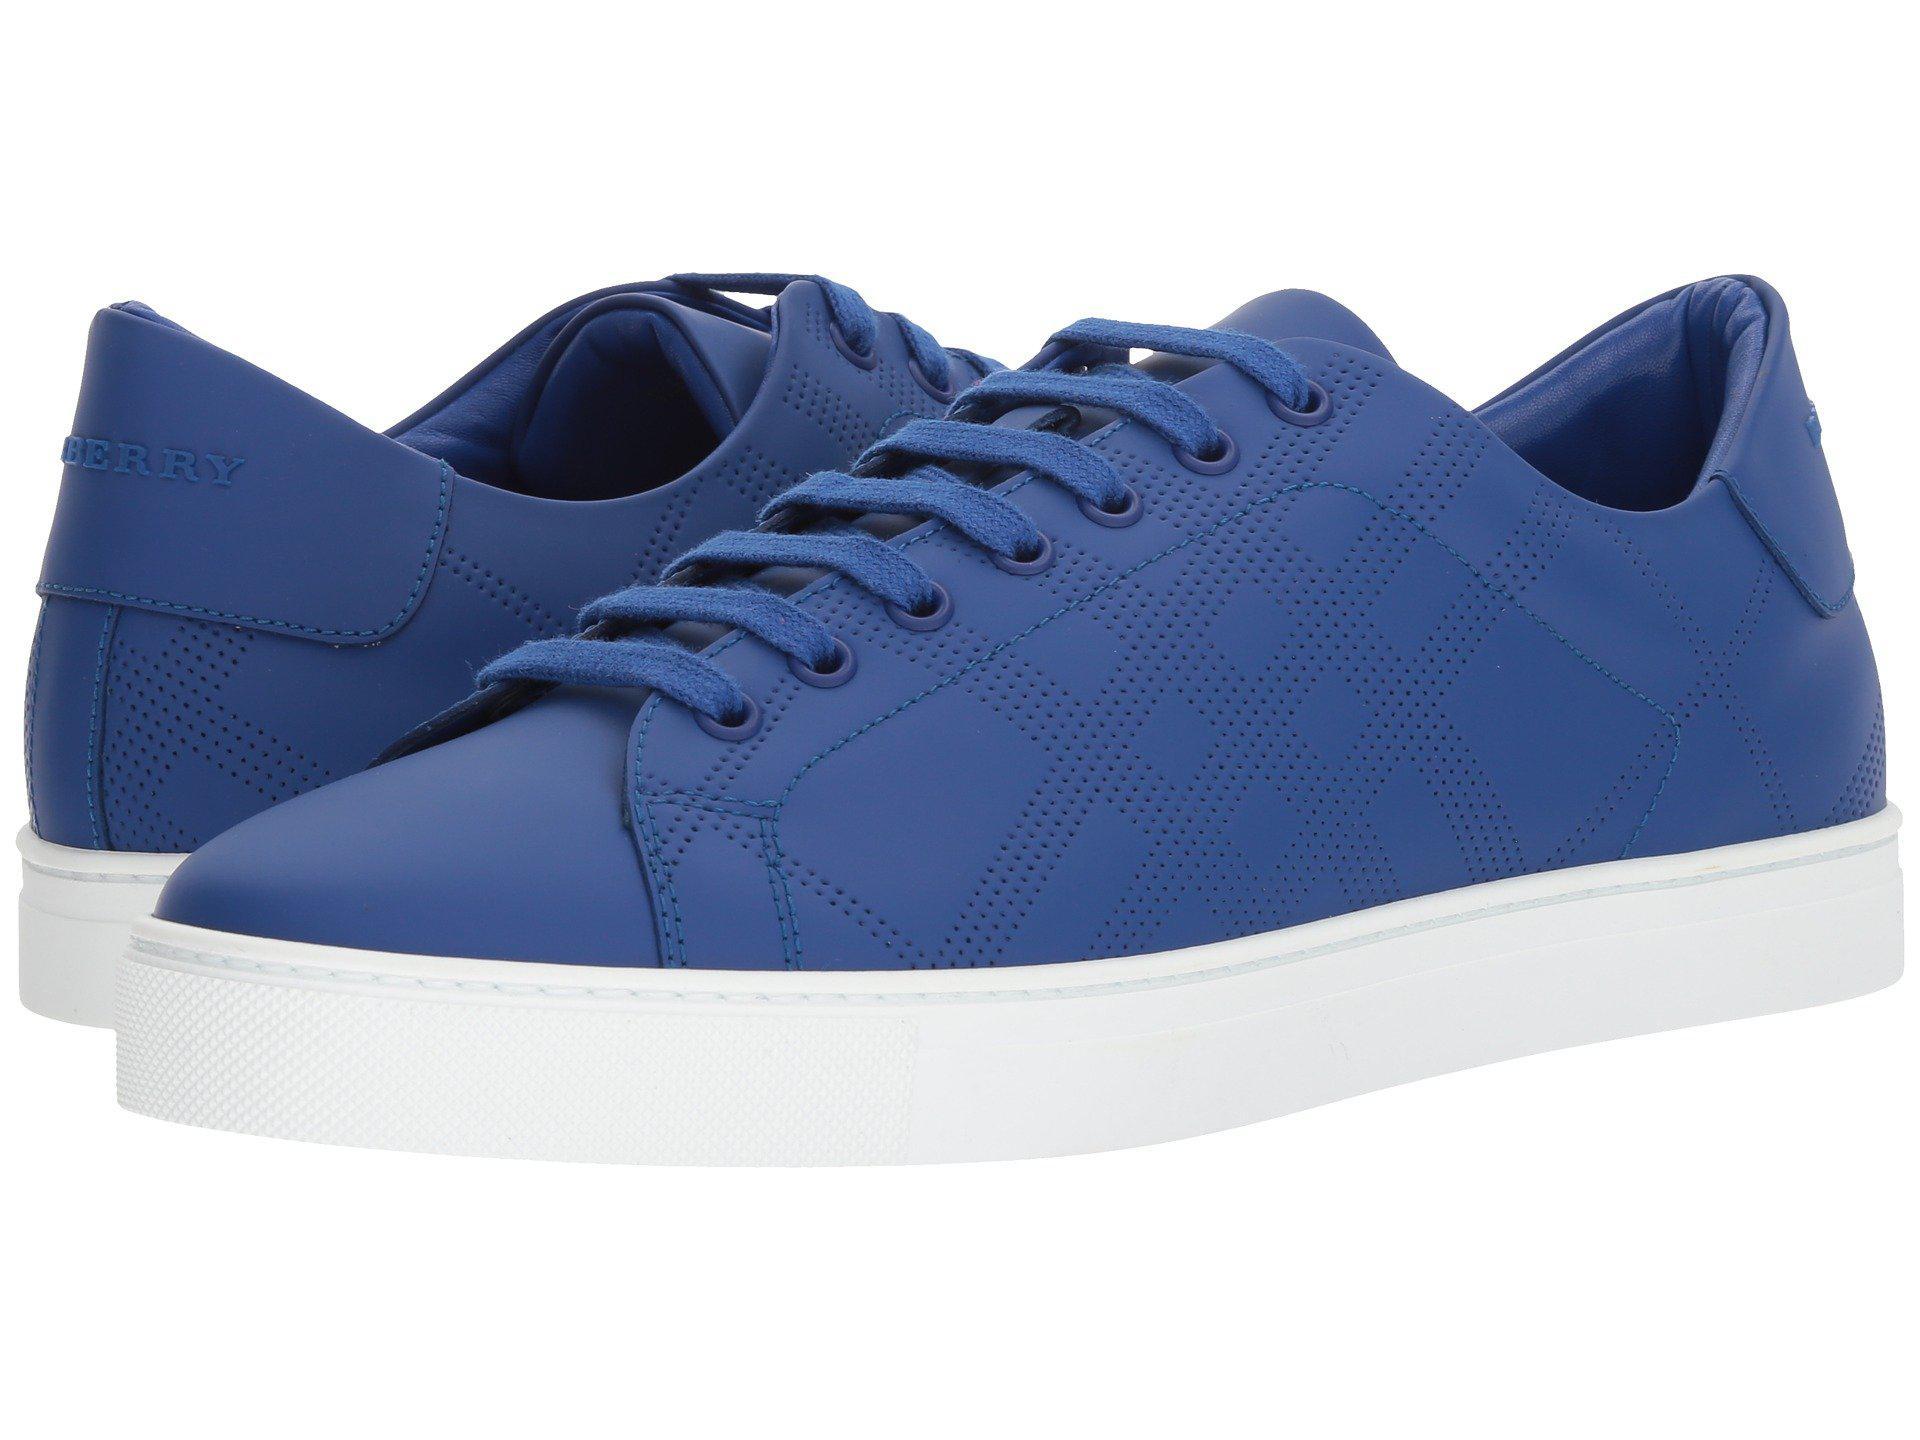 42c9b96c6bd0 Lyst - Burberry Albert Perforated Sneaker in Blue for Men